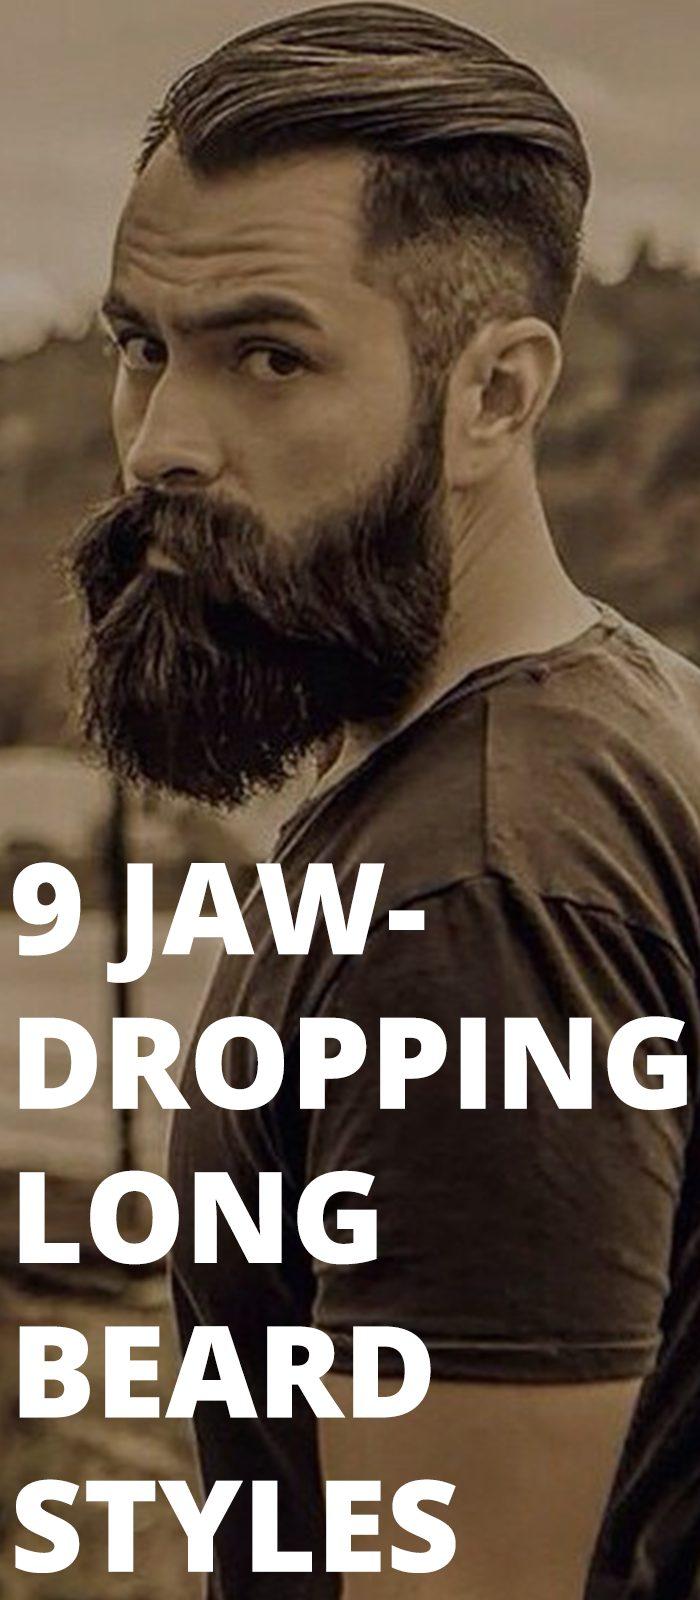 9 Jaw-Dropping Long Beard Styles